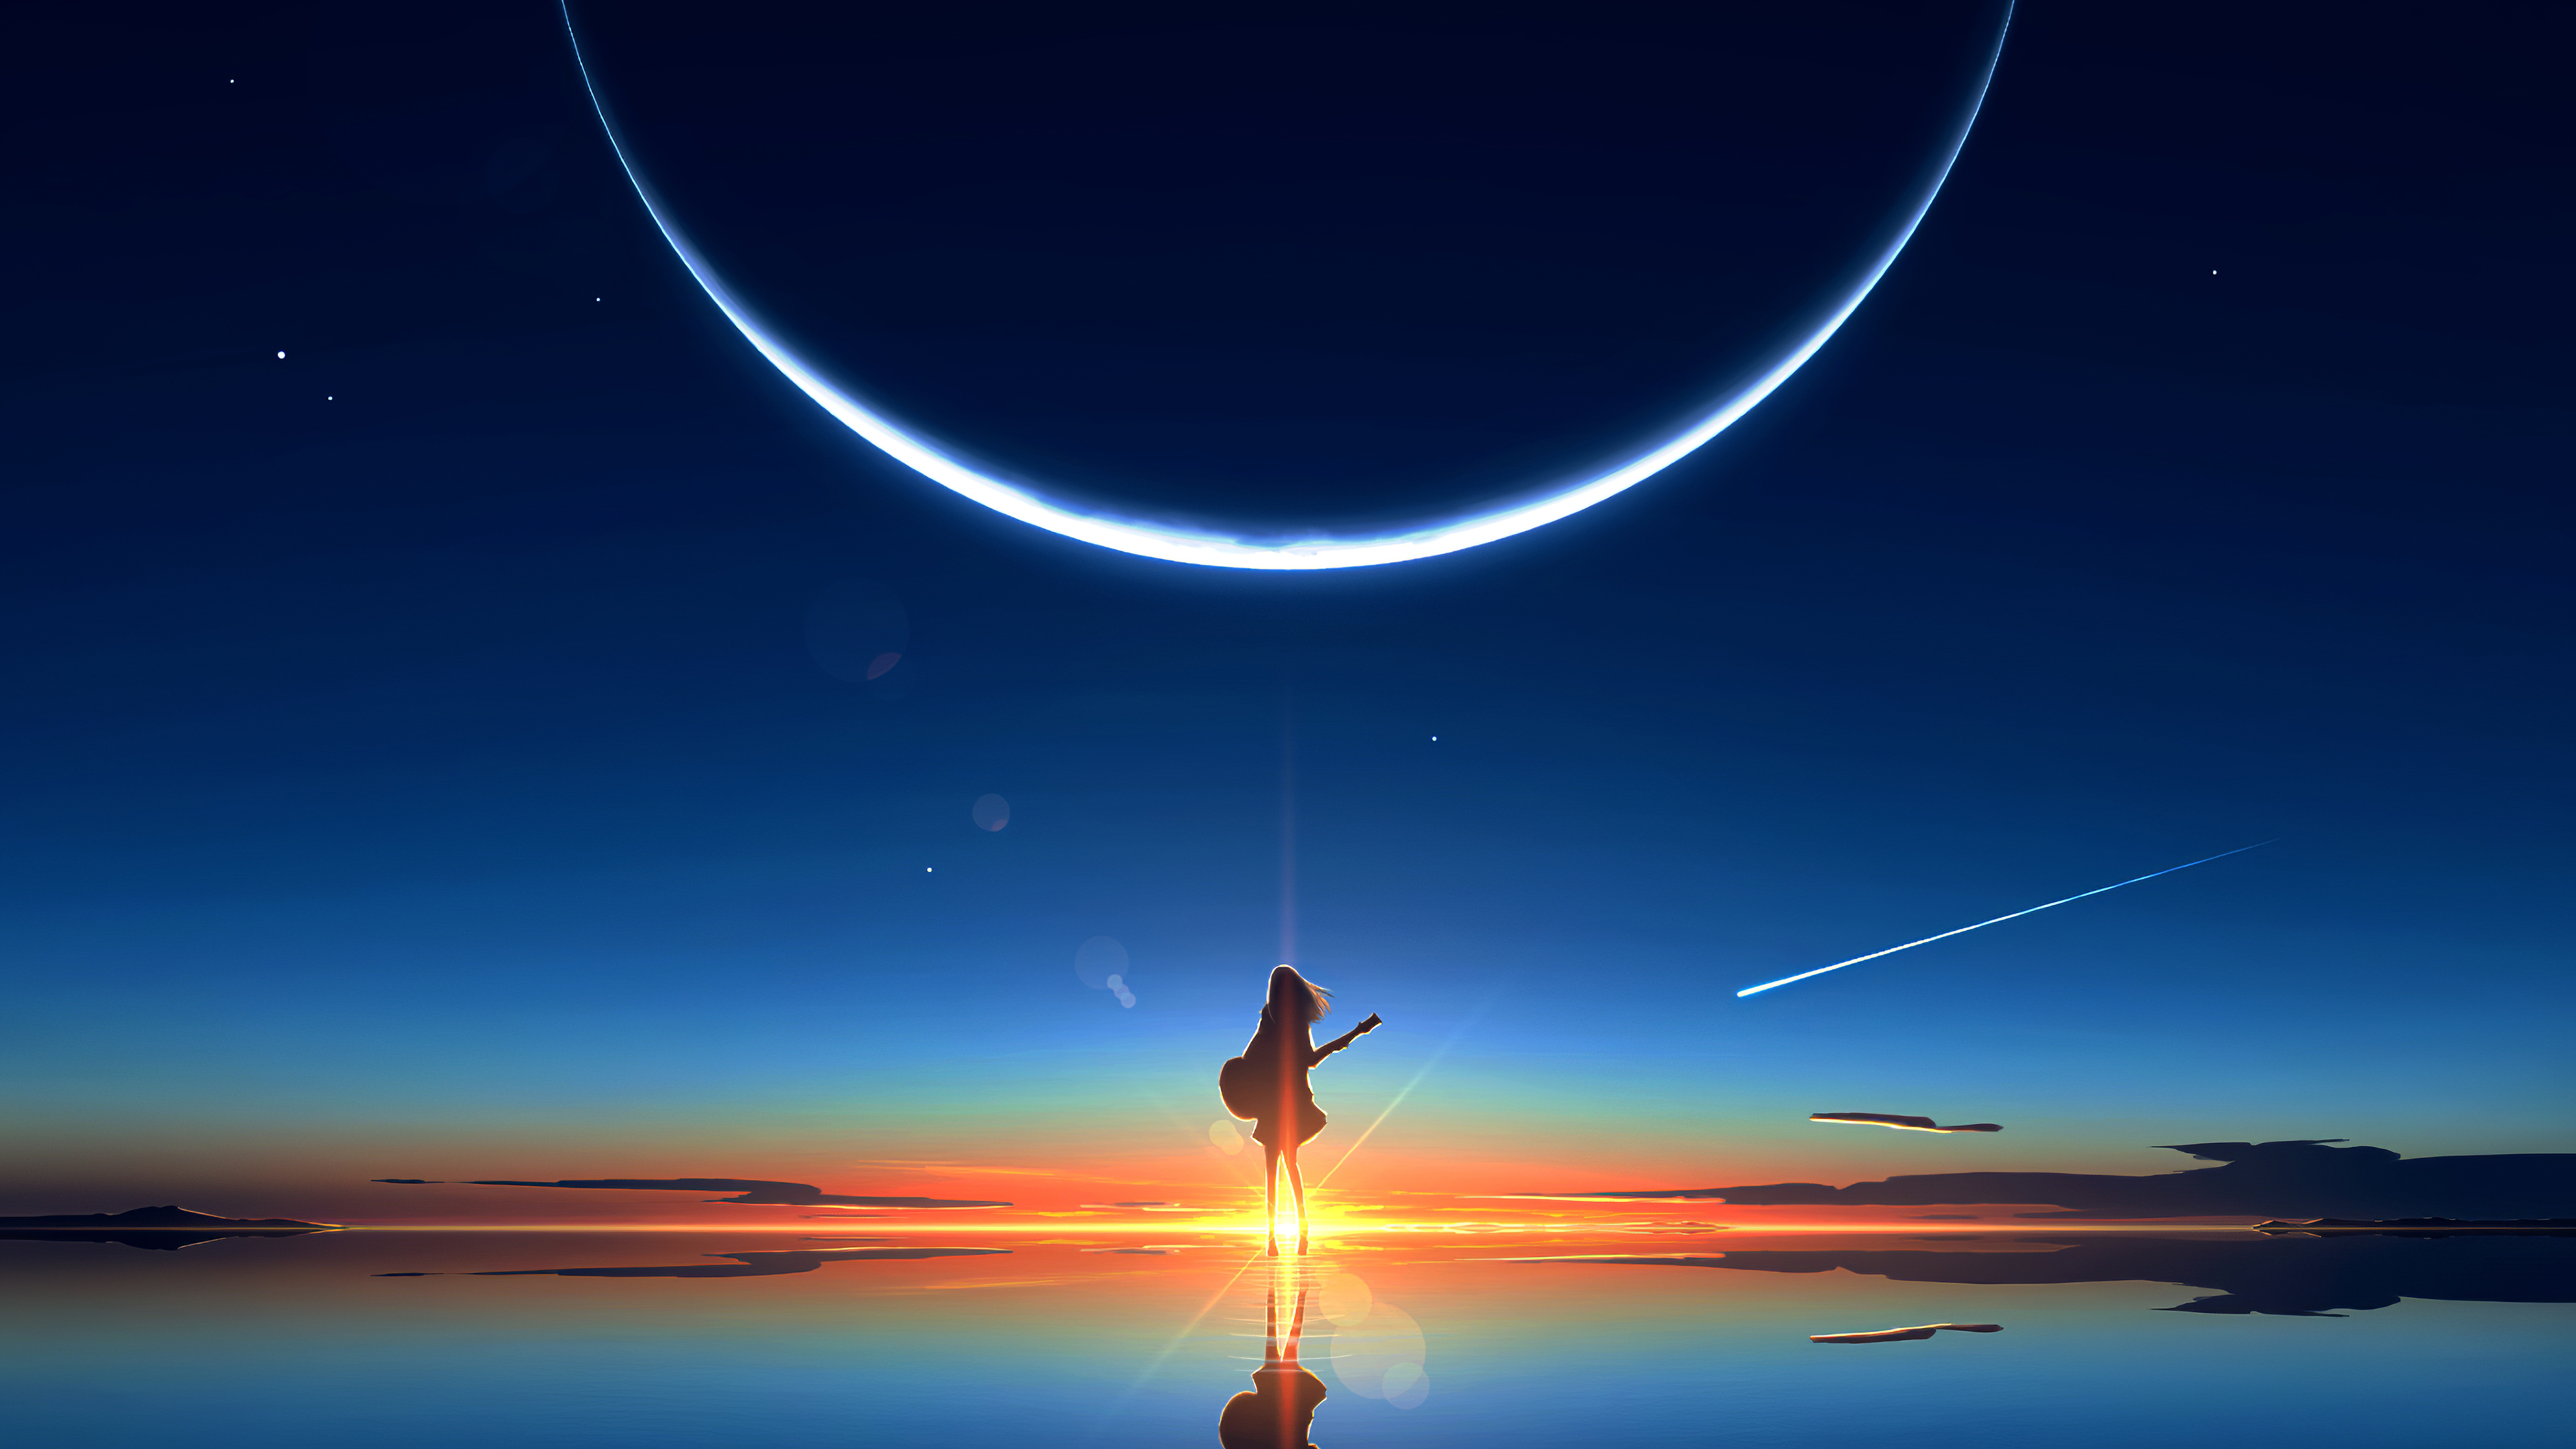 anime girl scenery 1578254329 - Anime Girl Scenery -